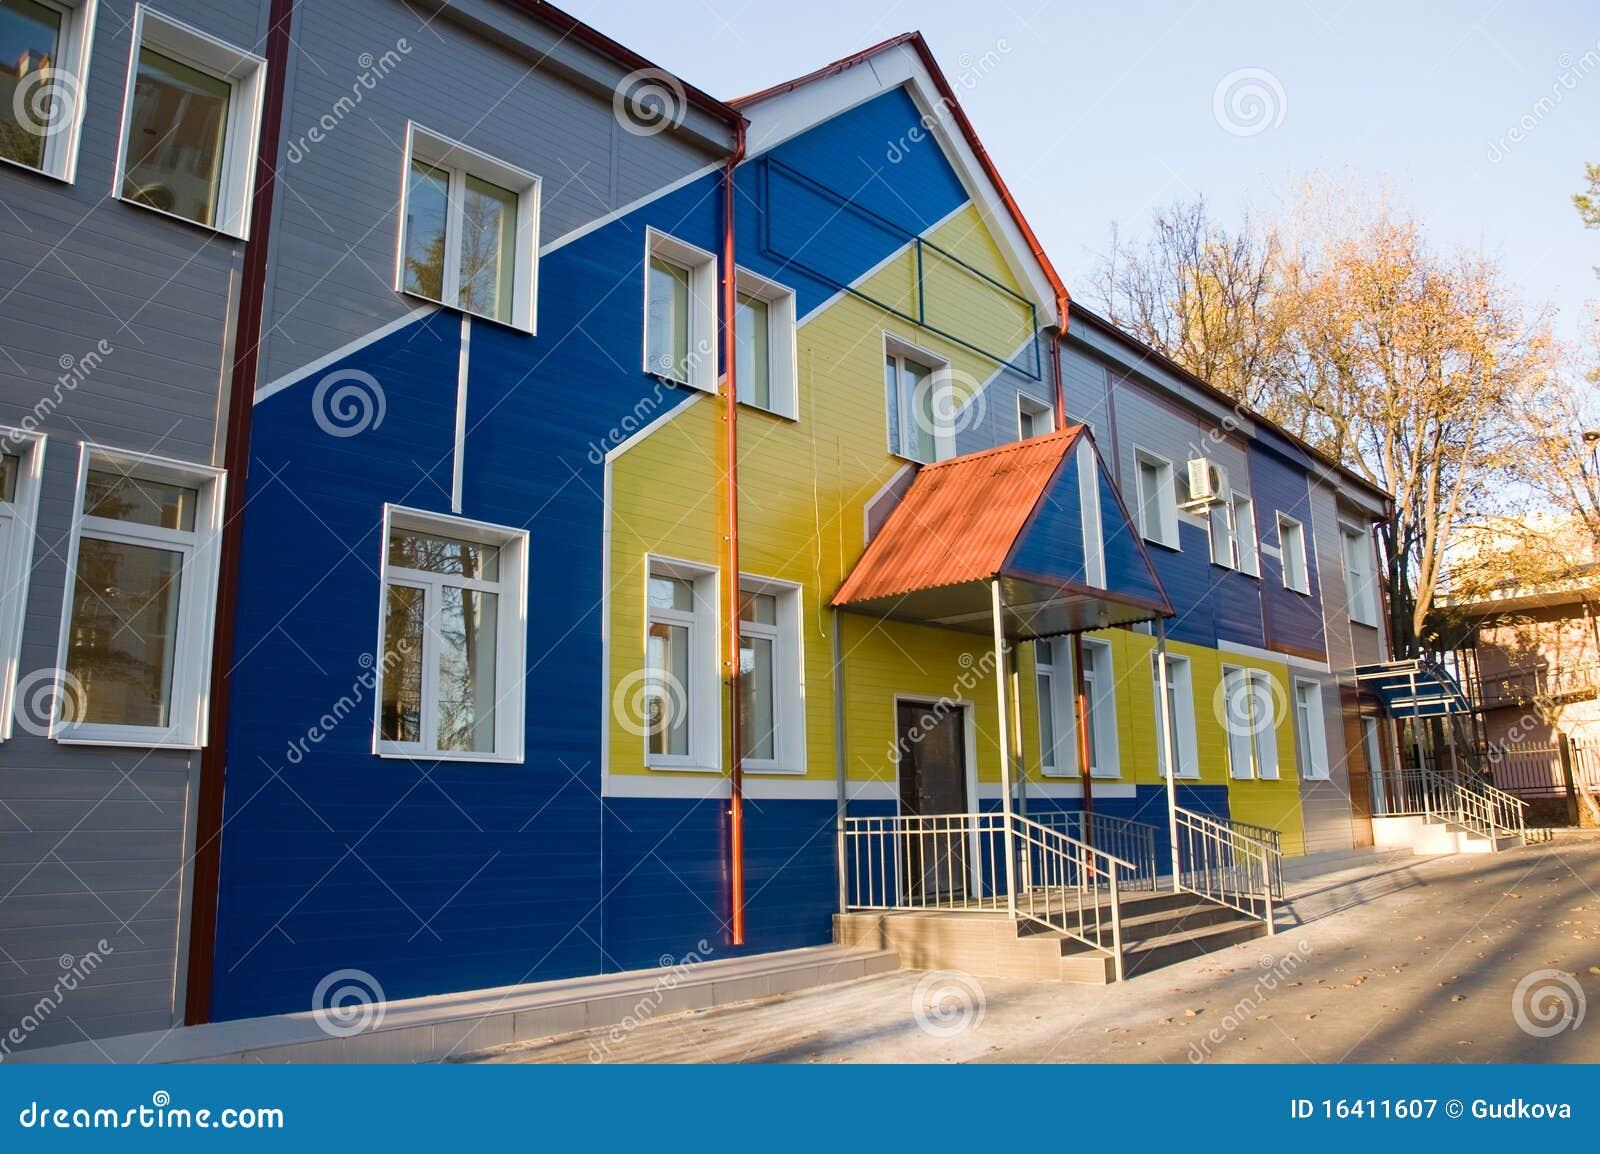 Nursery school stock image. Image of building, design - 16411607